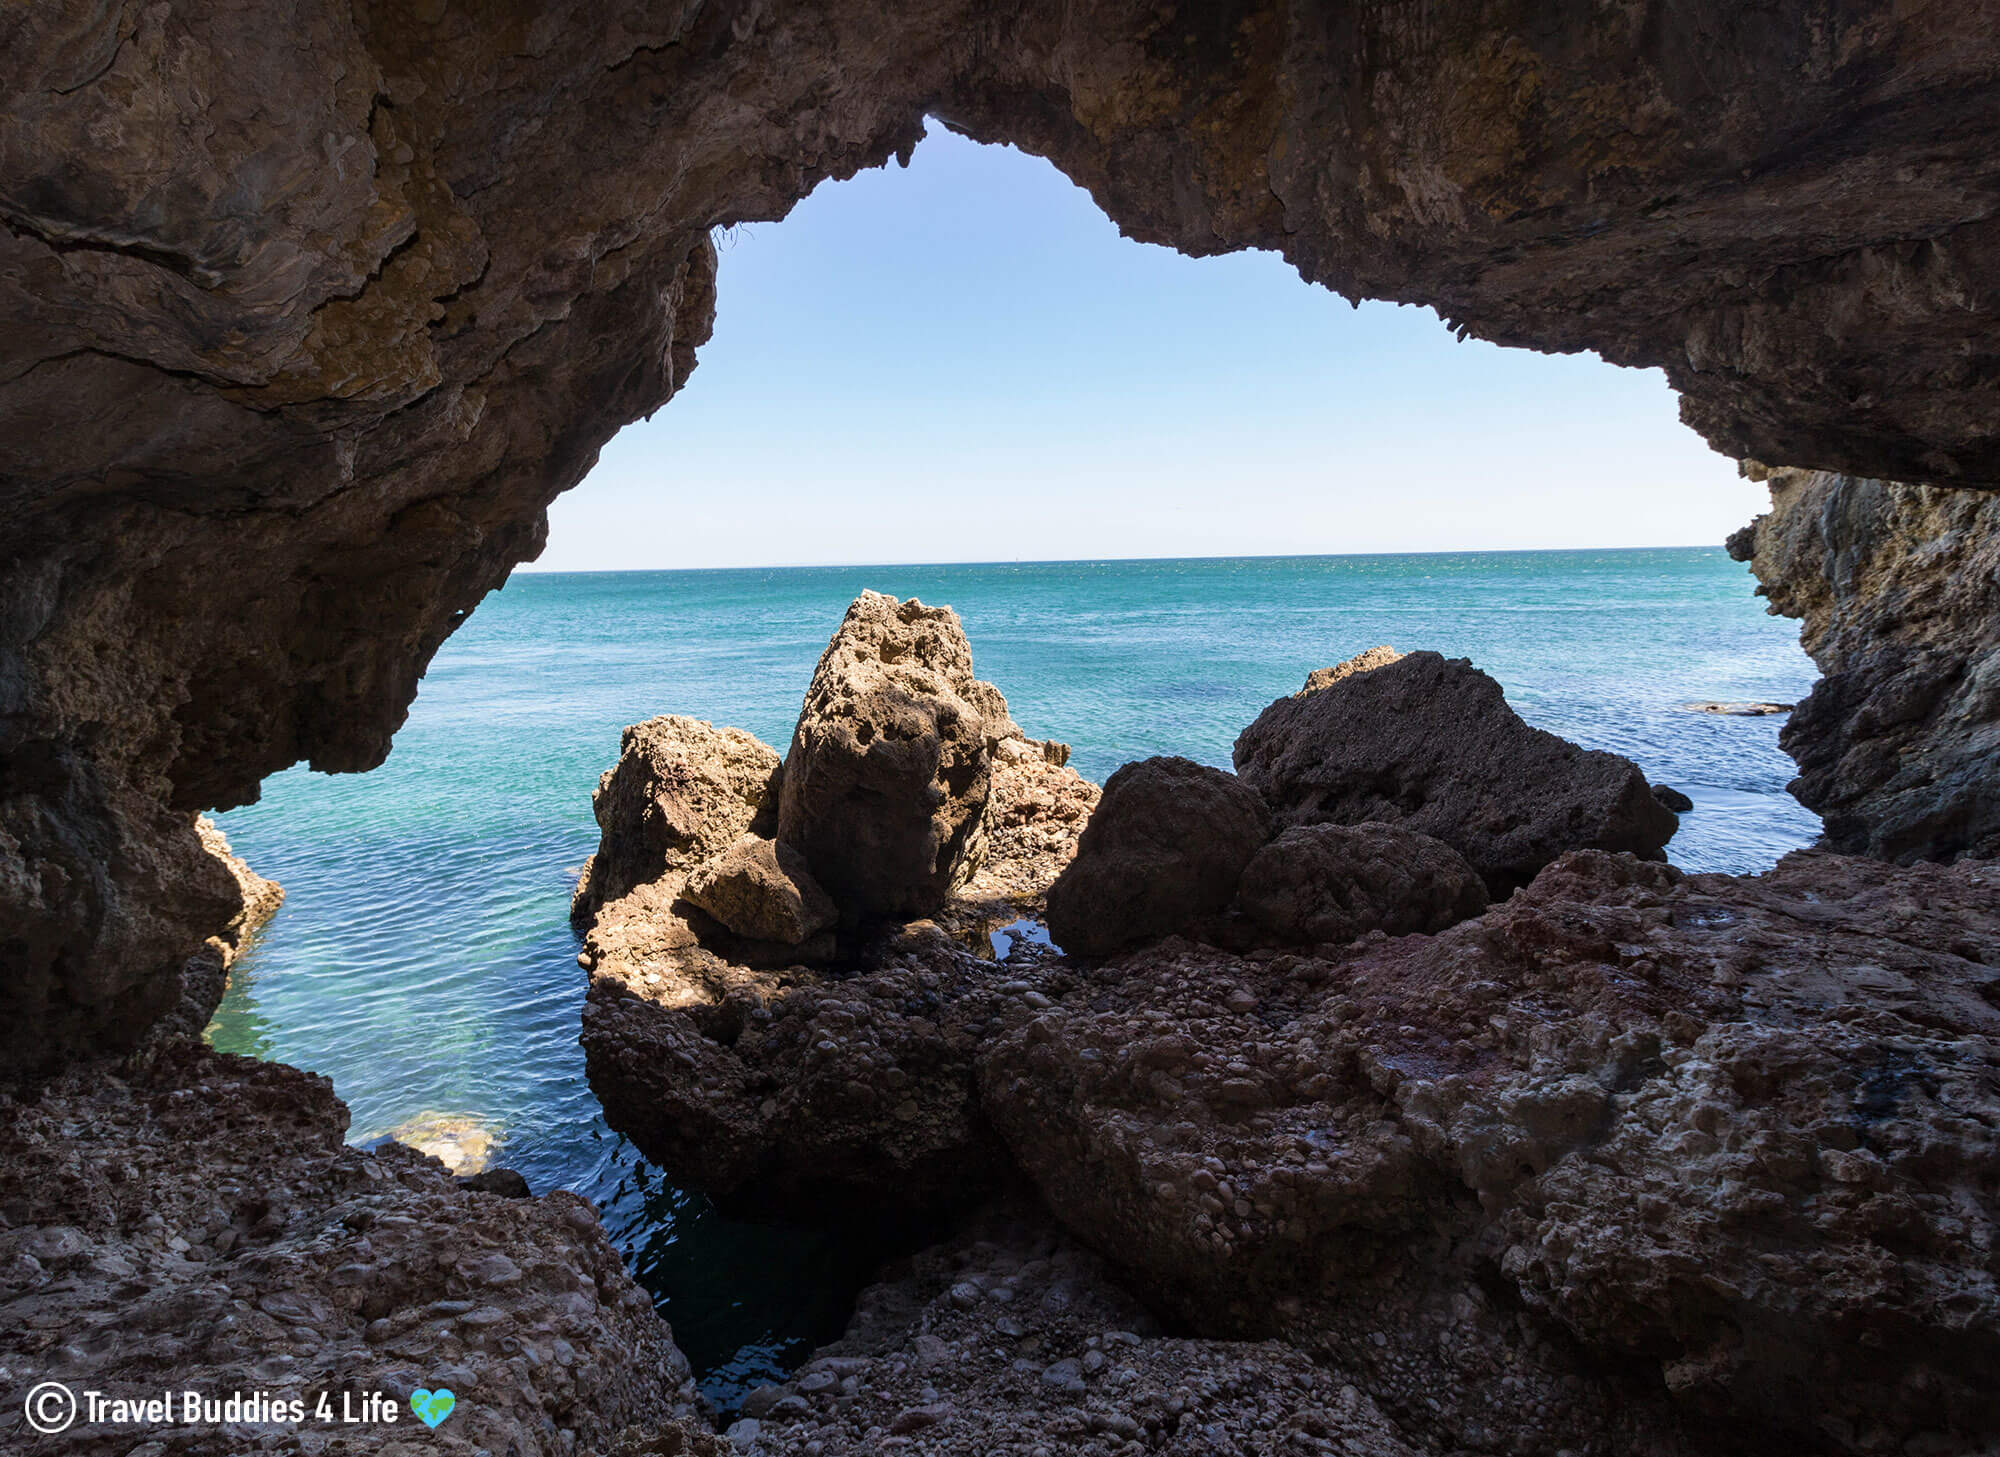 Large Sea Cave Along the Coast of Portugal's Arrábida Region